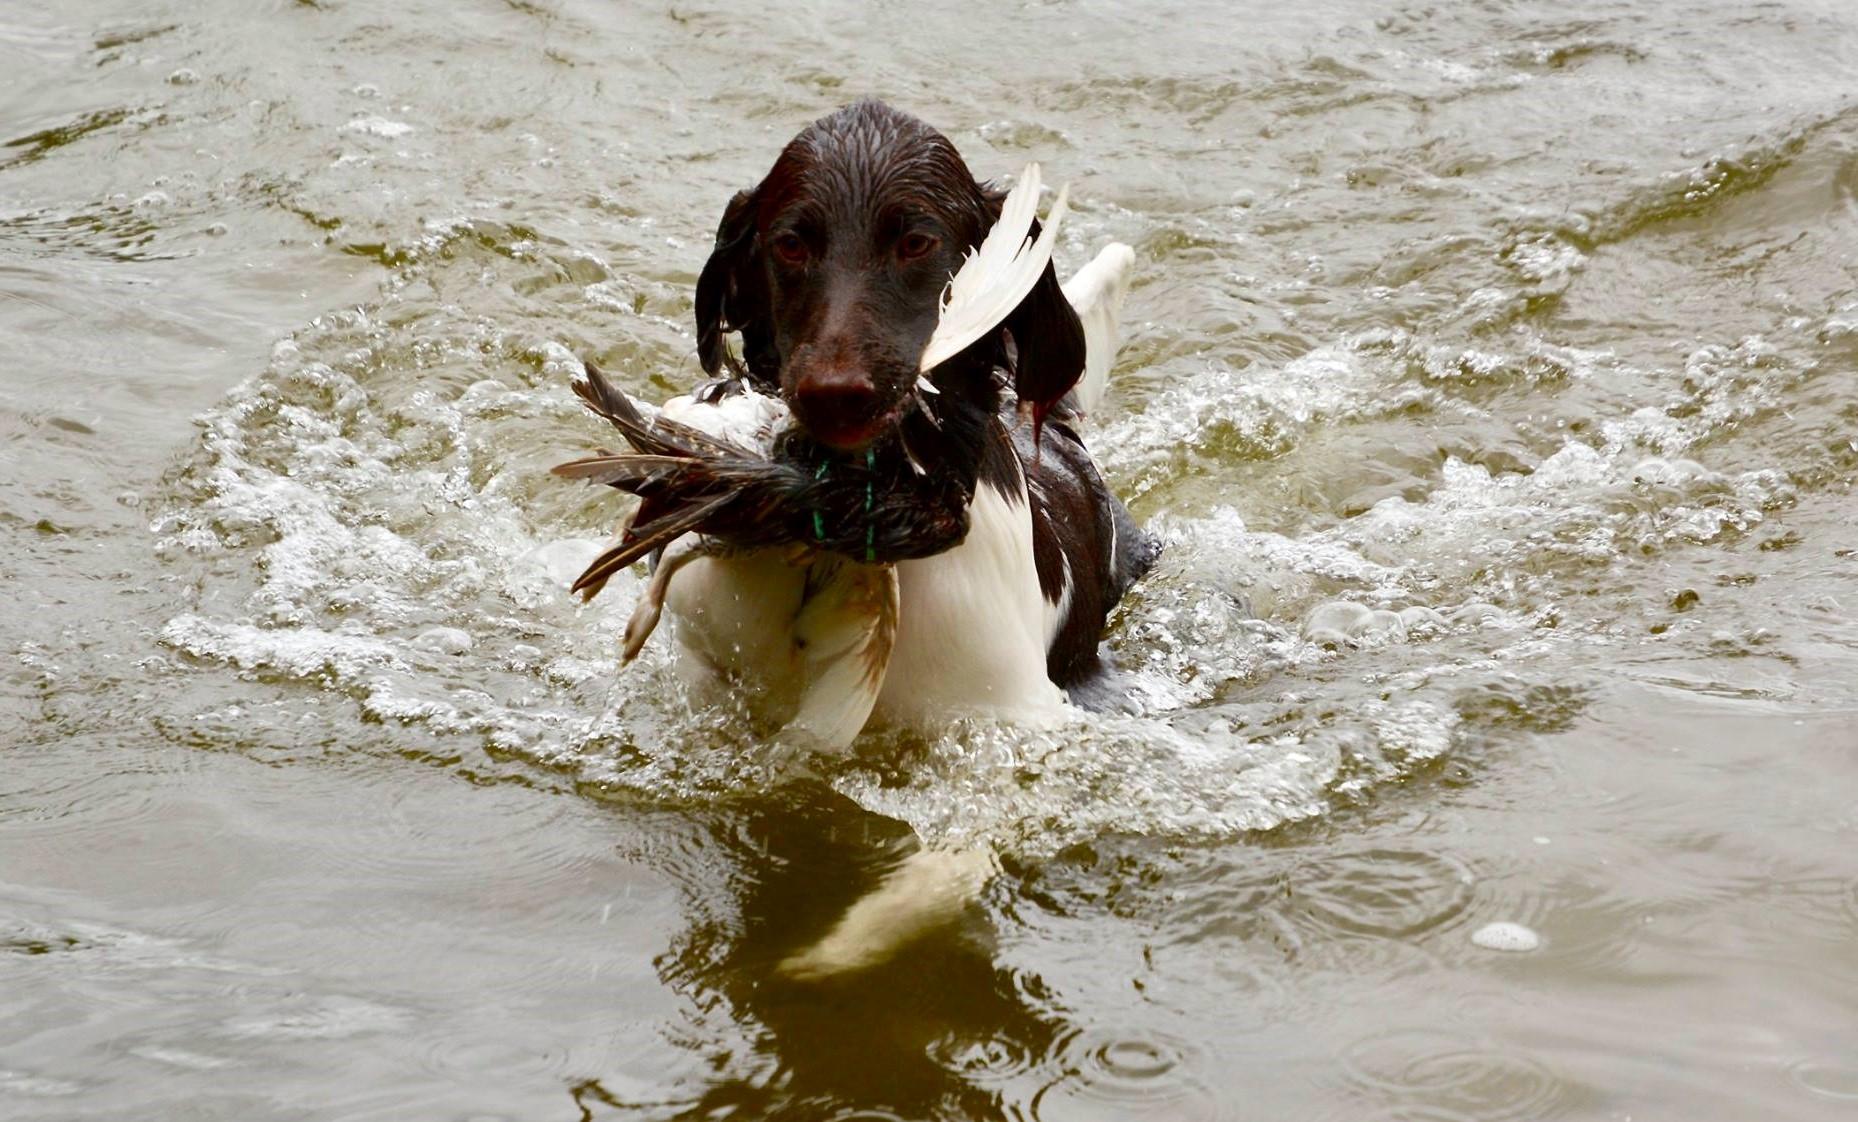 Cindy i vattnet 2